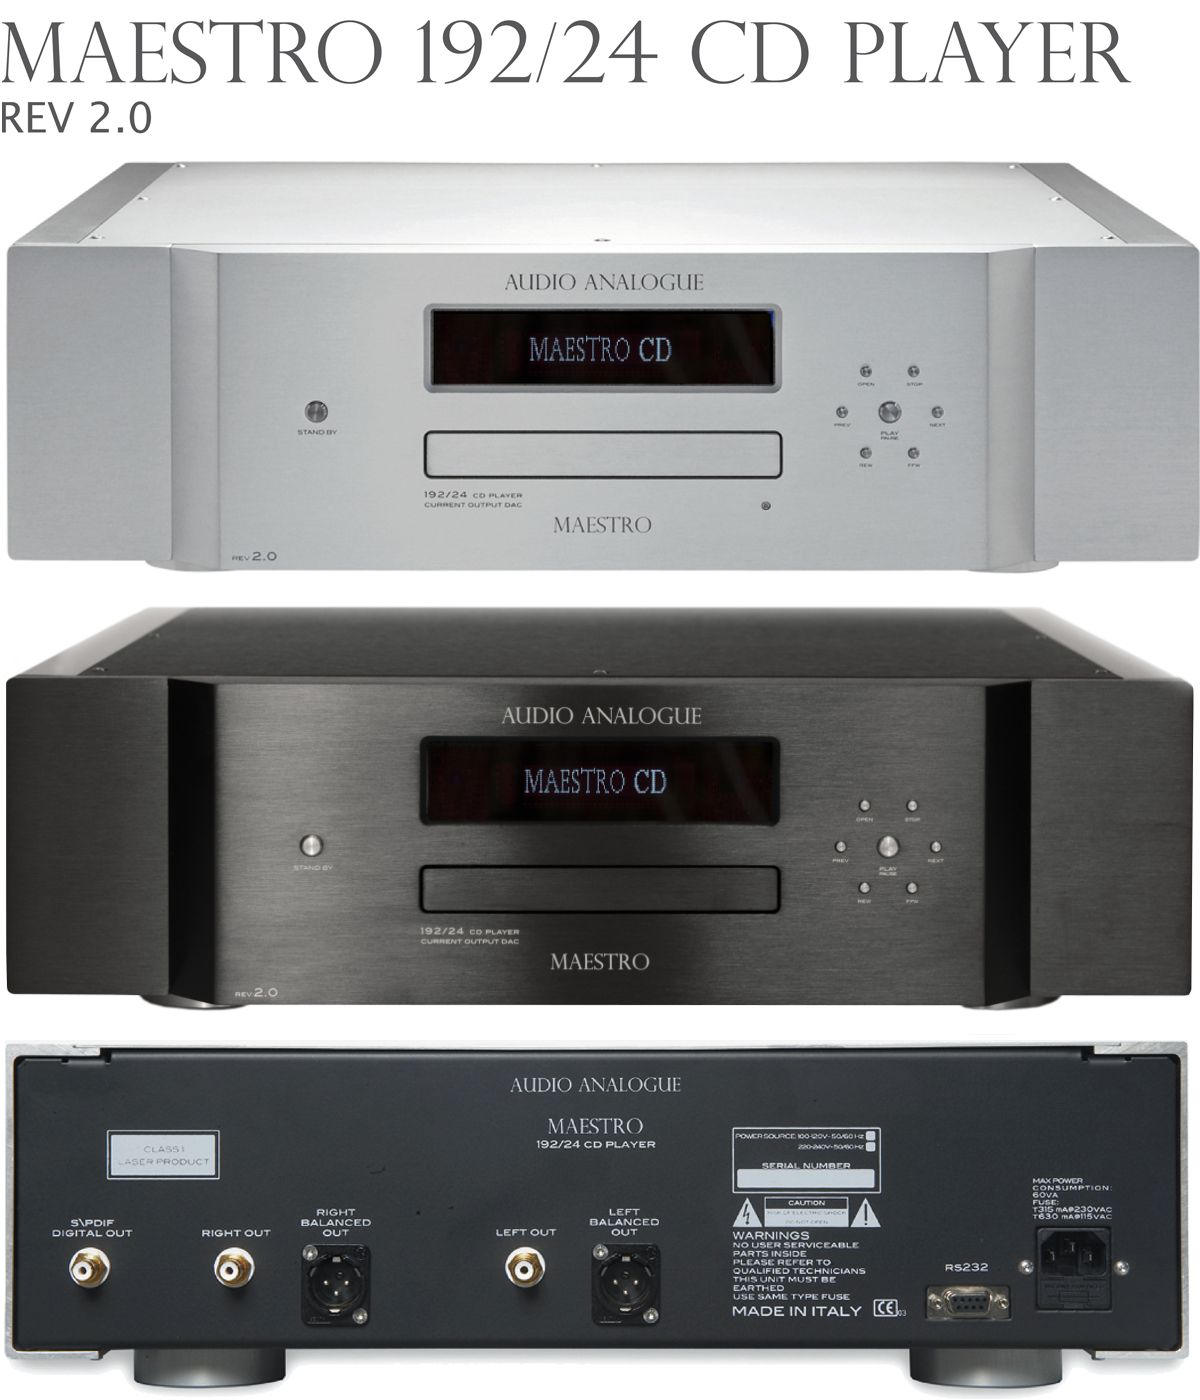 MAESTRO 192/24 REV2.0 CD PLAYER